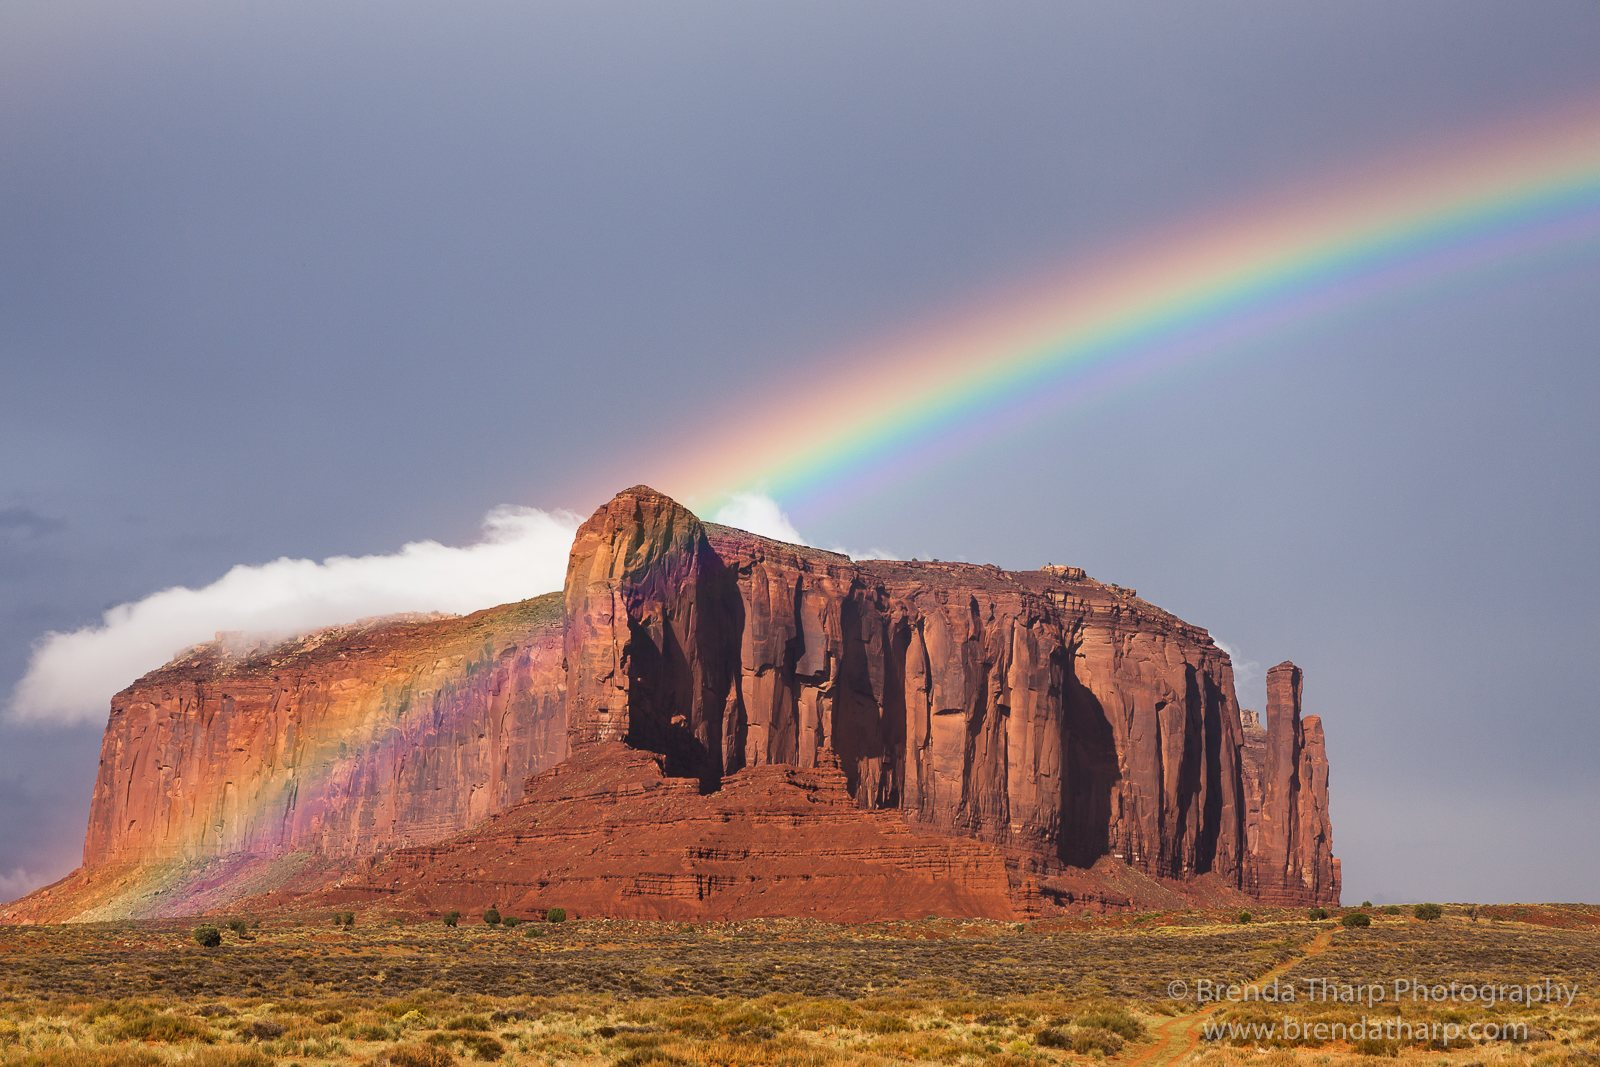 Rainbow, cloud and red rock butte, Utah.